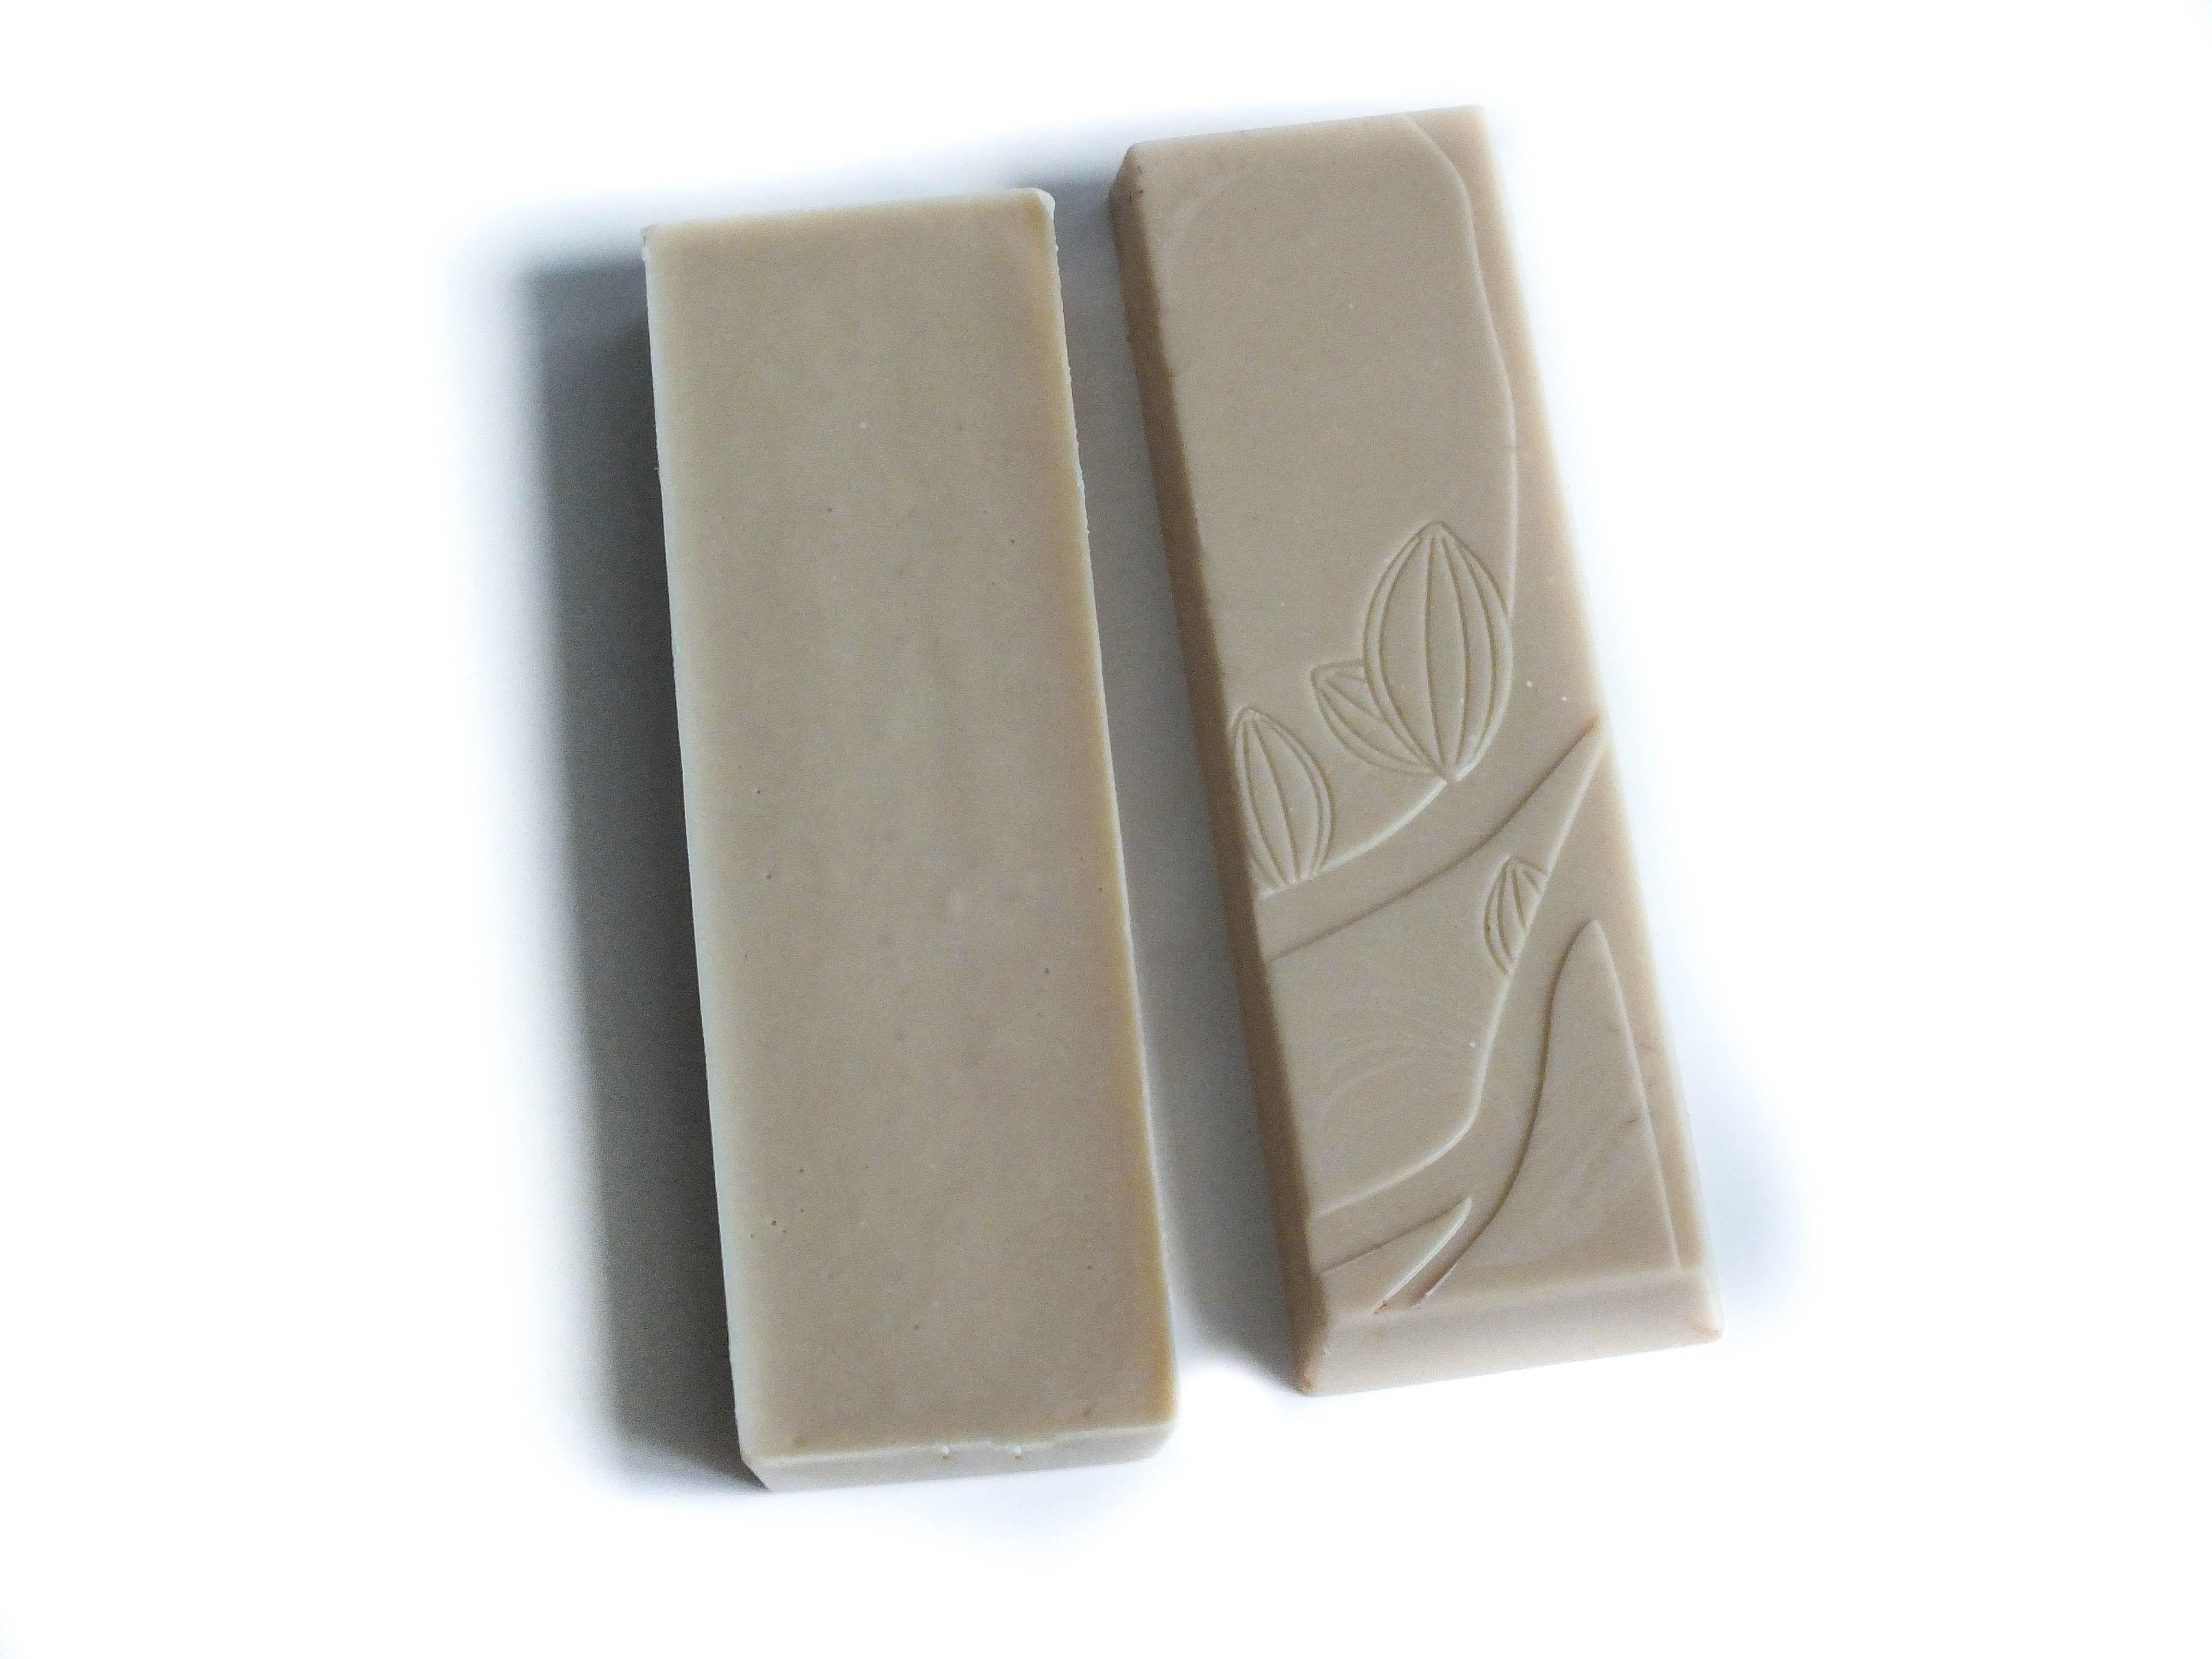 White Banana Chocolate Bar